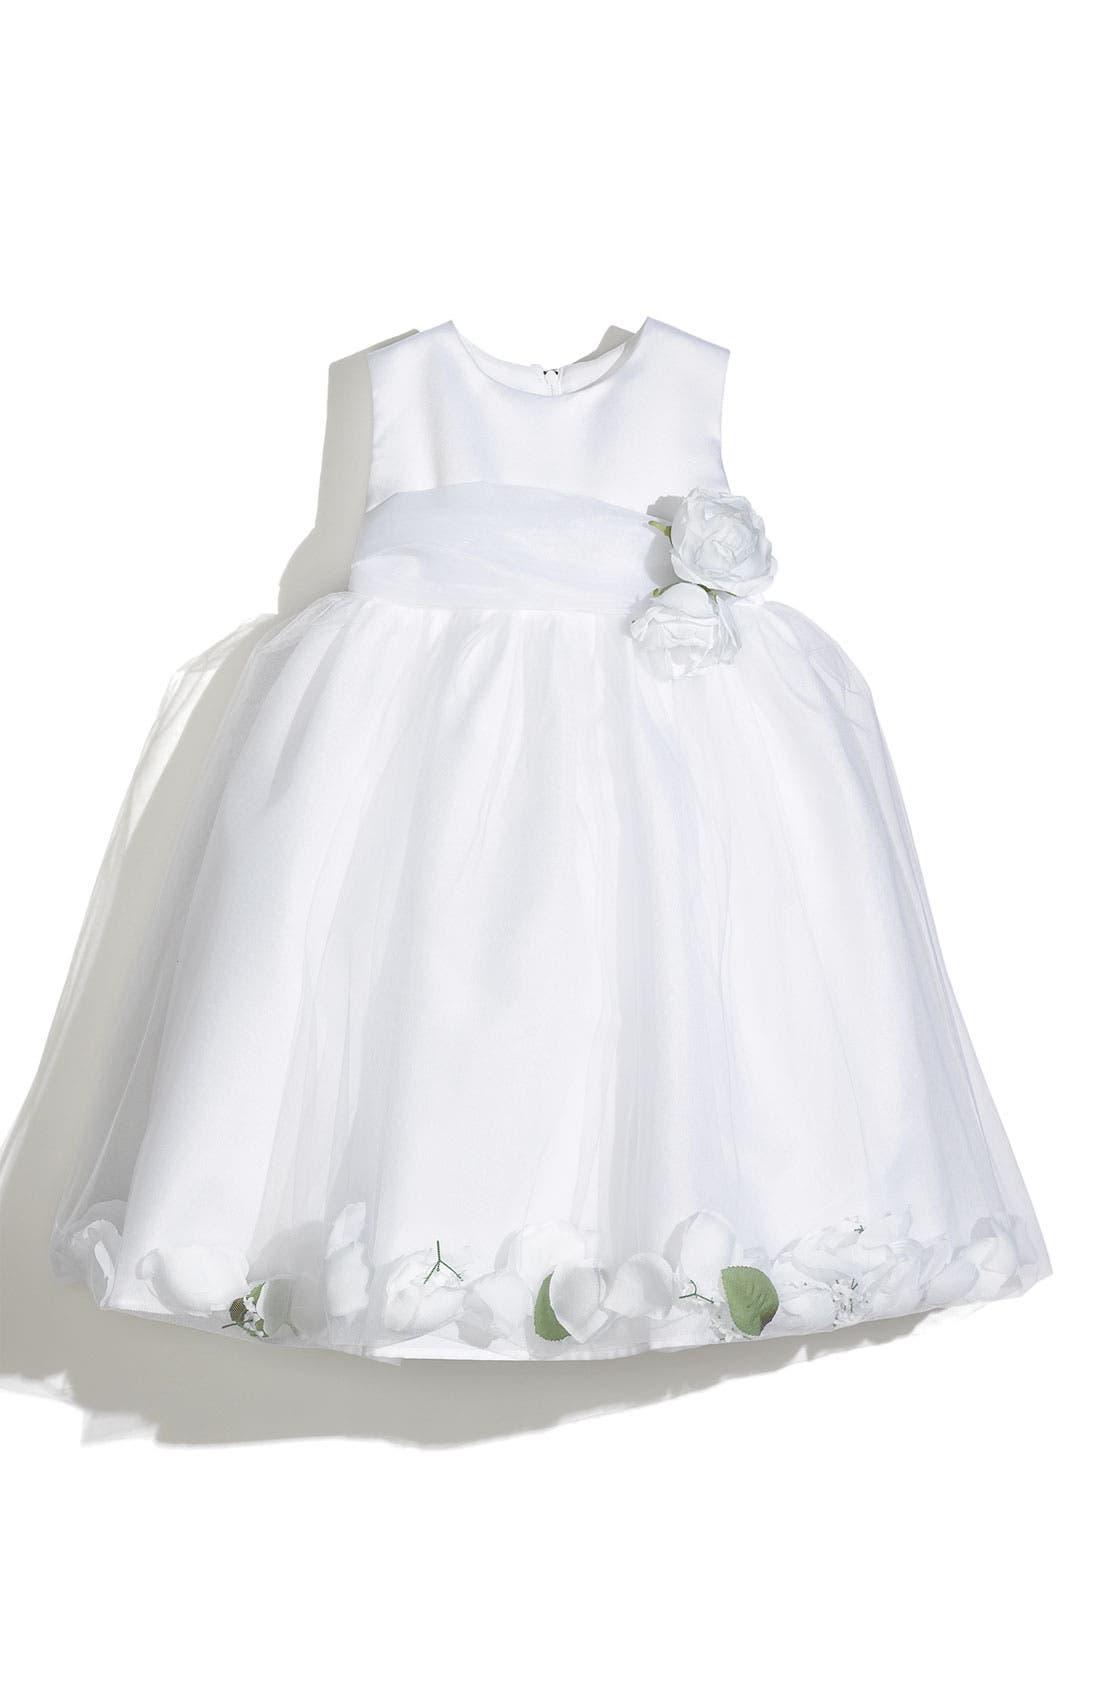 Petal Dress,                         Main,                         color, White/ White